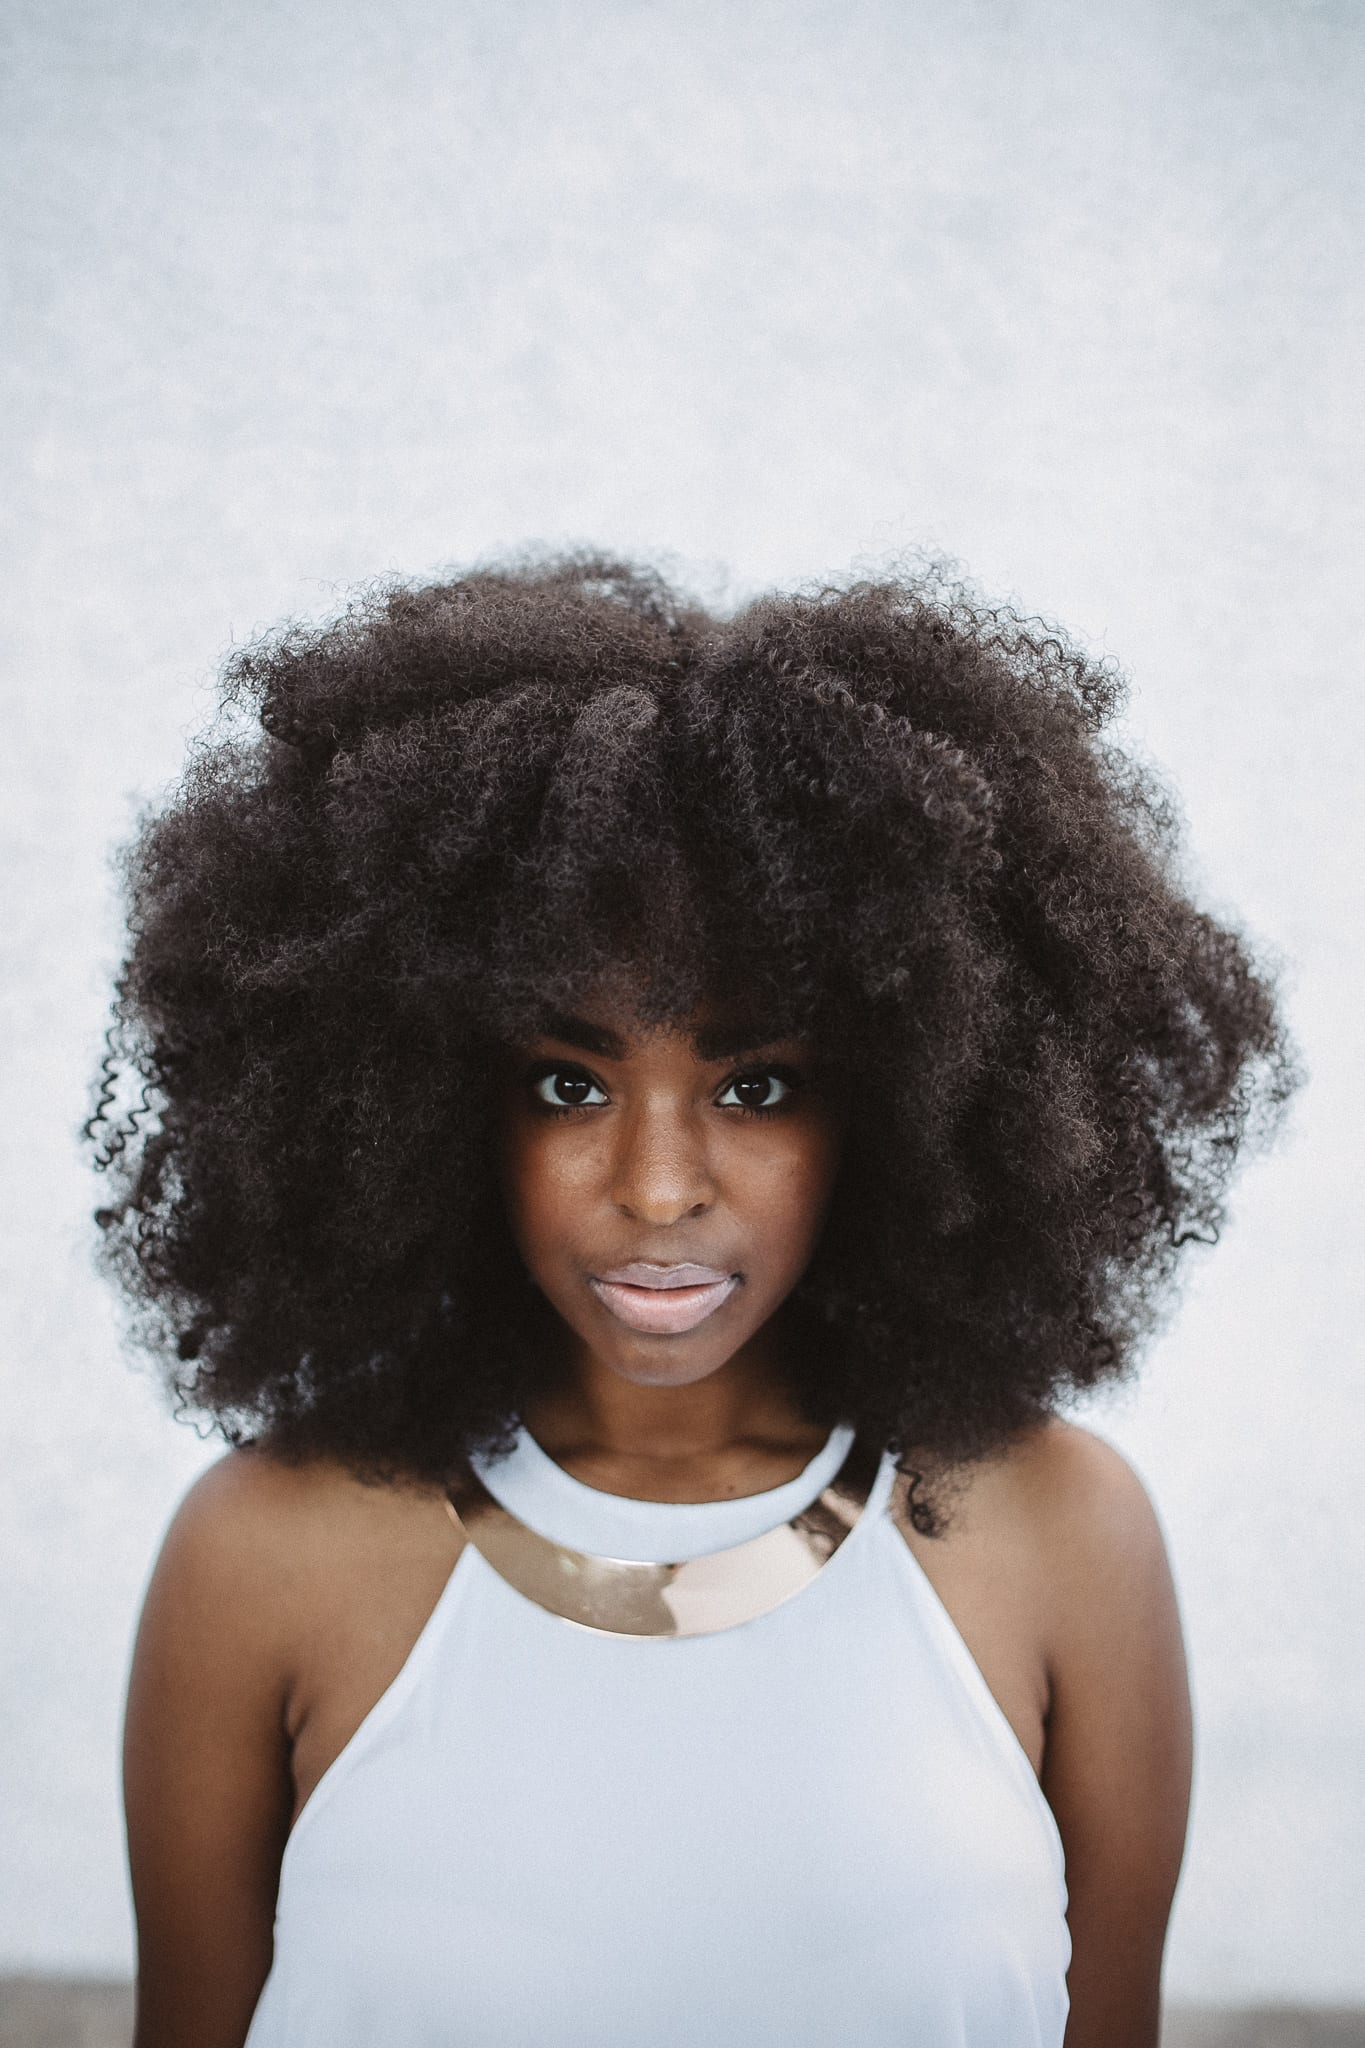 sundial-bridge-california-portrait-photographer-black-afro-queen-birthday-5